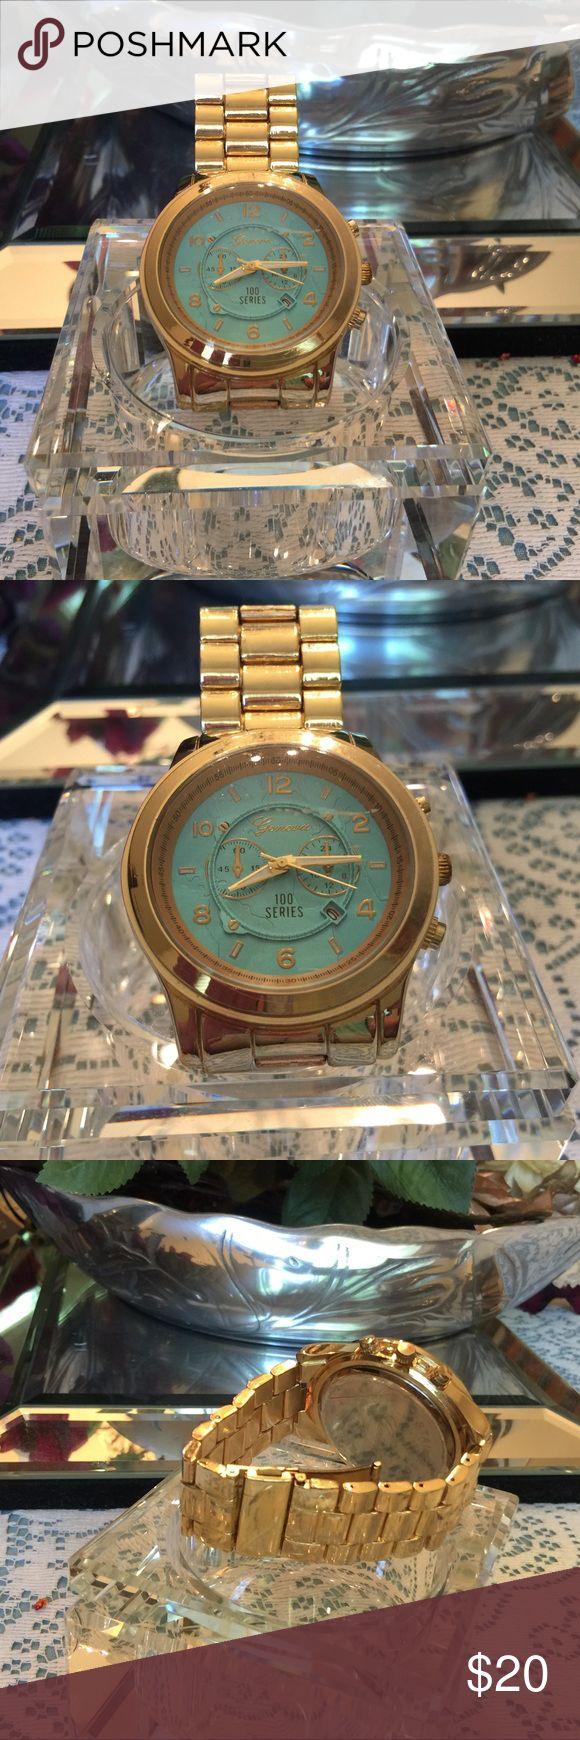 Geneva Boyfriend Watch Gold tone with robins egg blue face. It is Geneva's 100 Series Boyfriend Watch. Needs battery.🎀🎀 Geneva 100 Series Accessories Watches